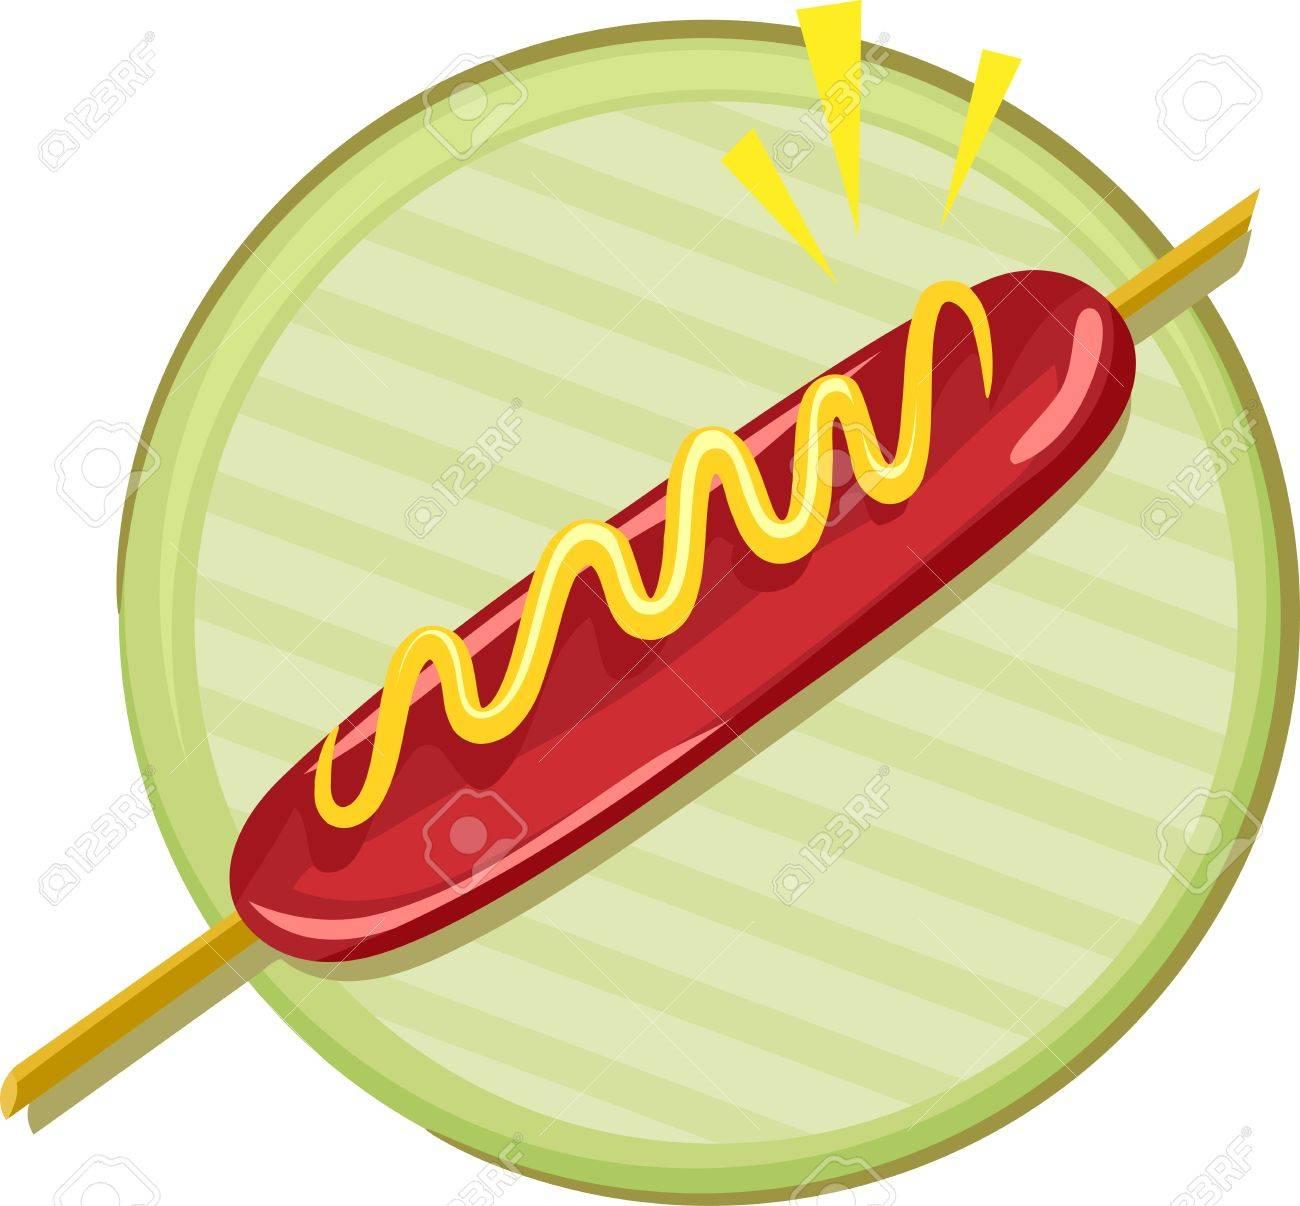 Hotdog On Stick Clipart.